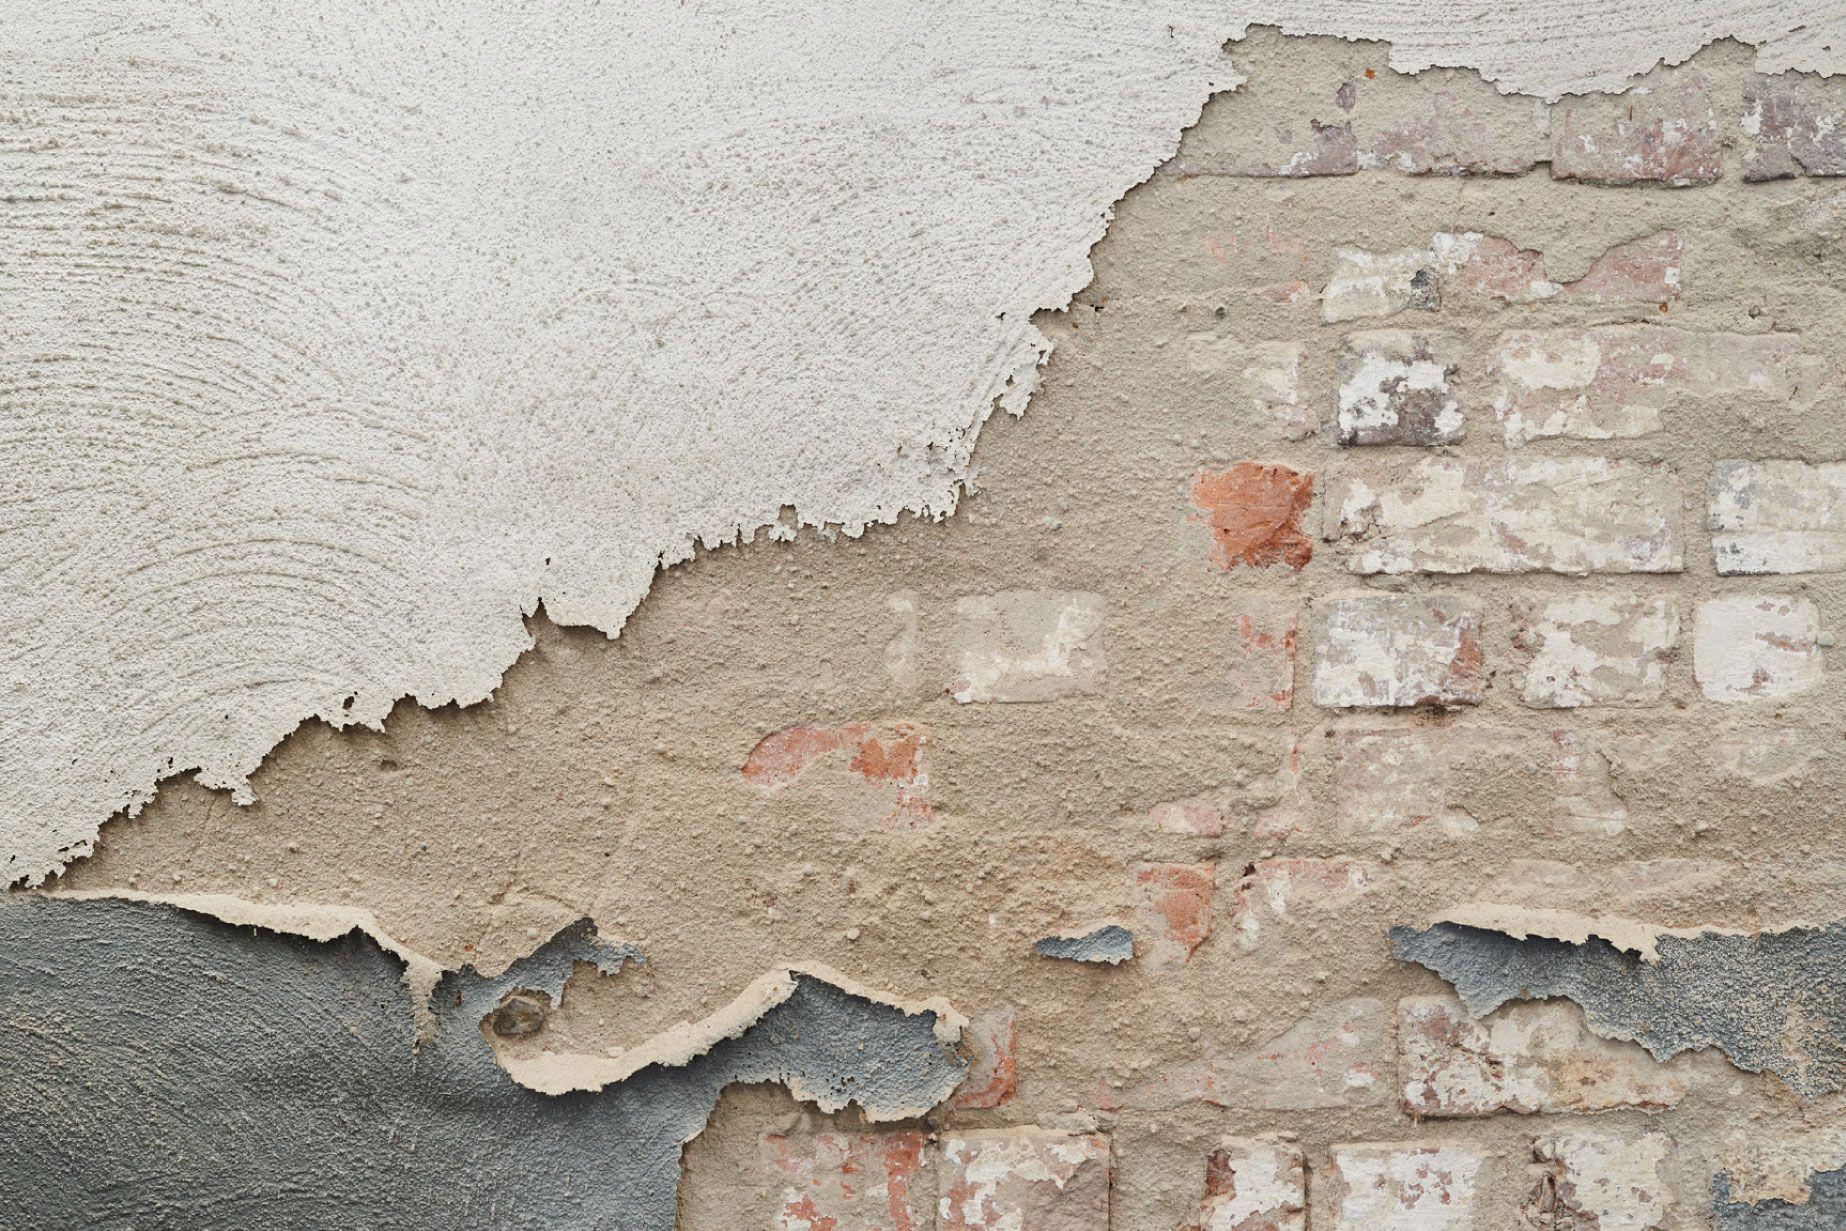 Peel By Milieu Milieu Property Peel, Decor, Home decor